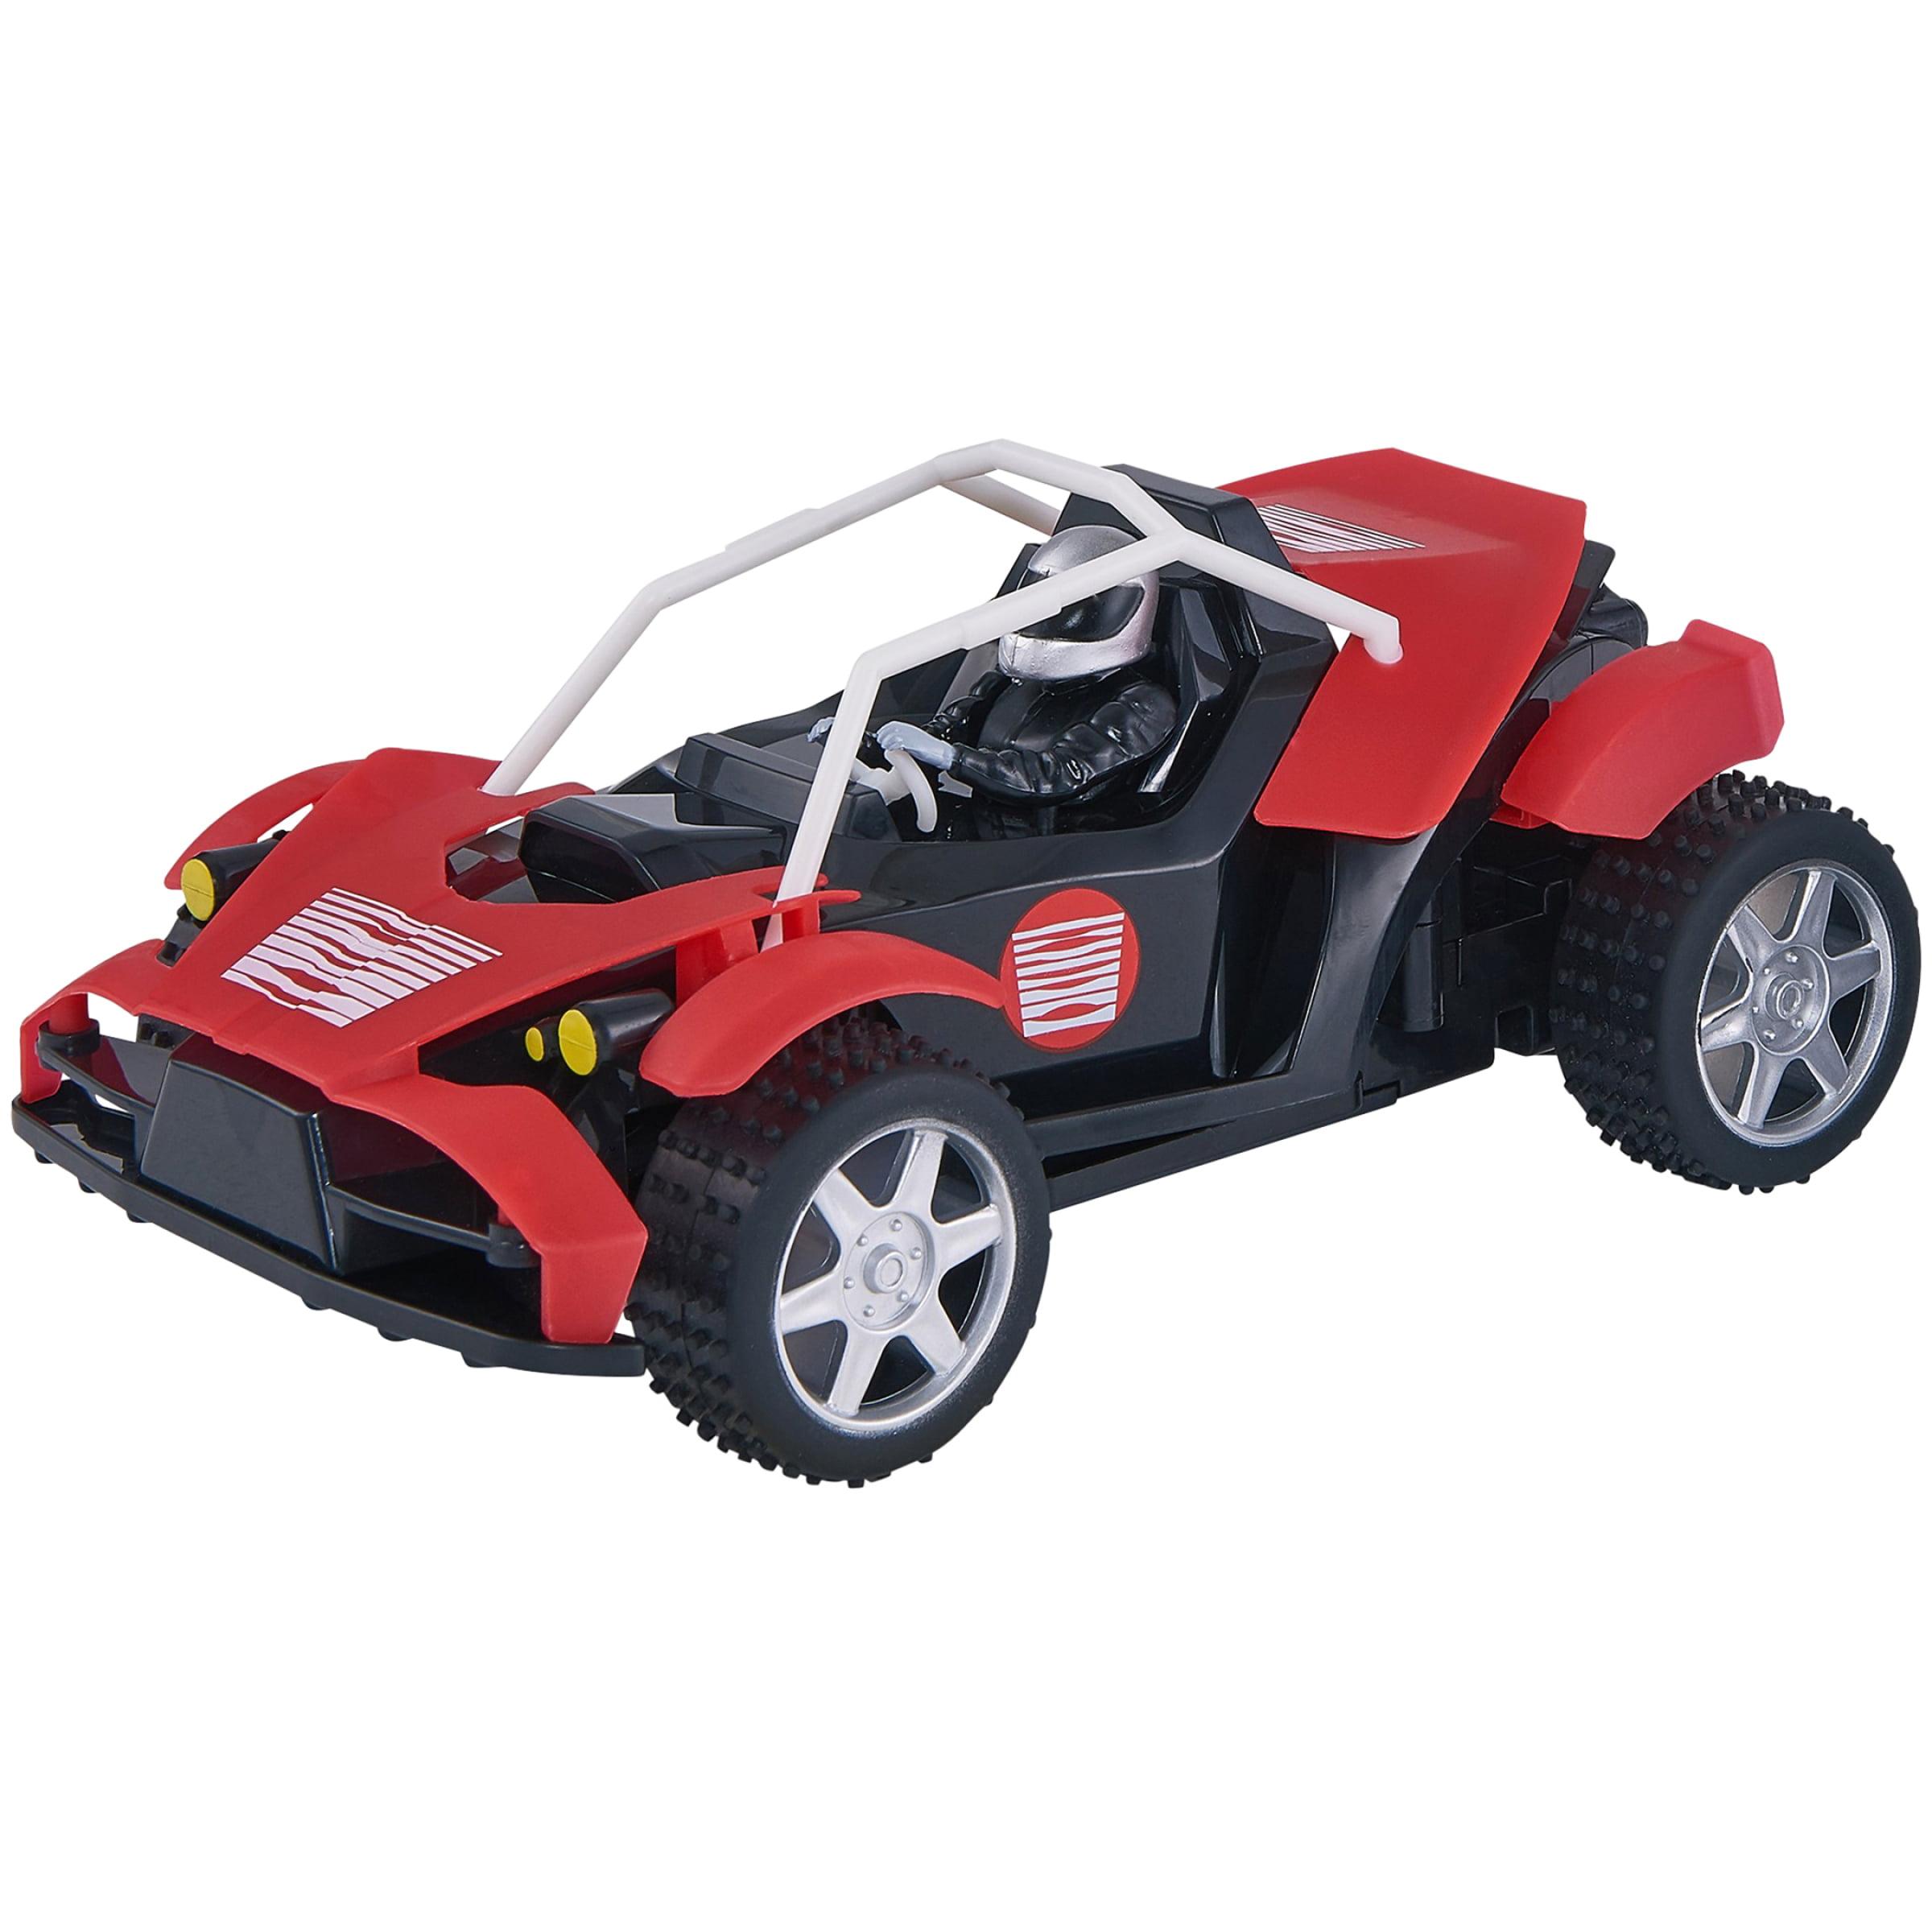 Adventure Force 98' Range Night Racer Radio Controlled Vehicle, Red & Black